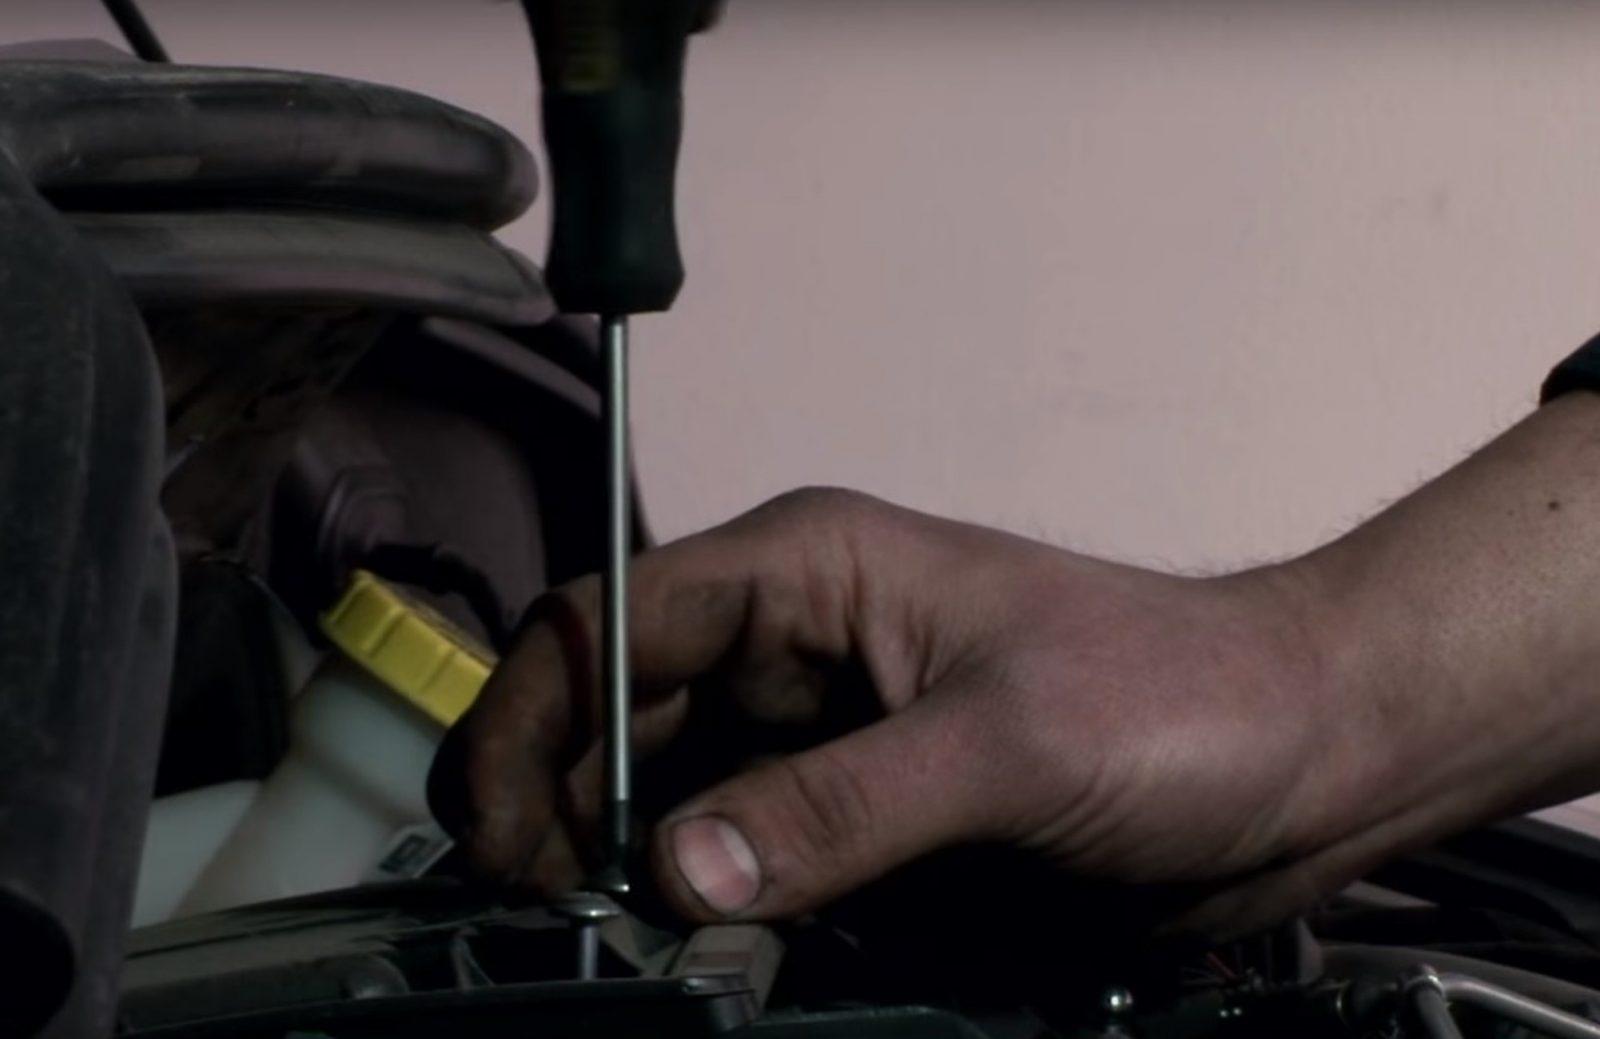 Zamjena filtera na Peugeot vozilima